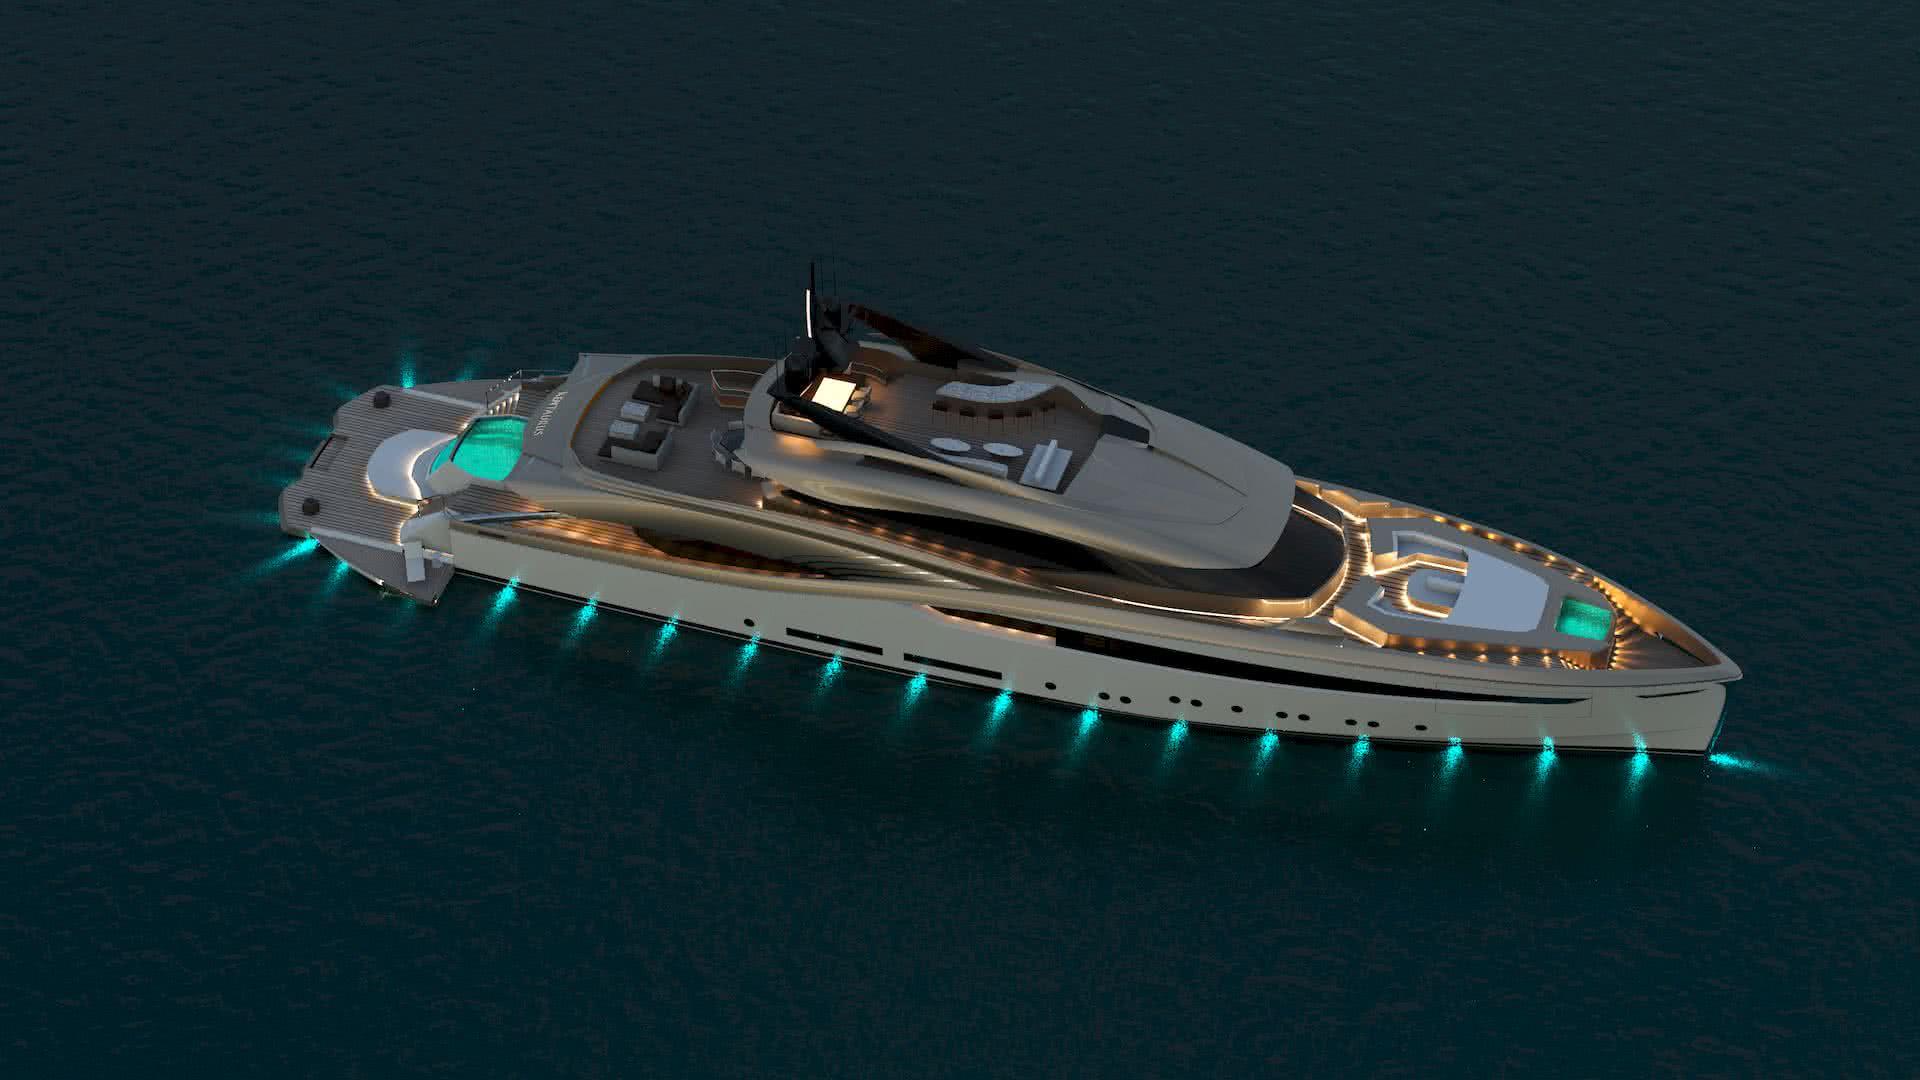 KENTAURUS Alpha Marine Yacht Design Yachtley